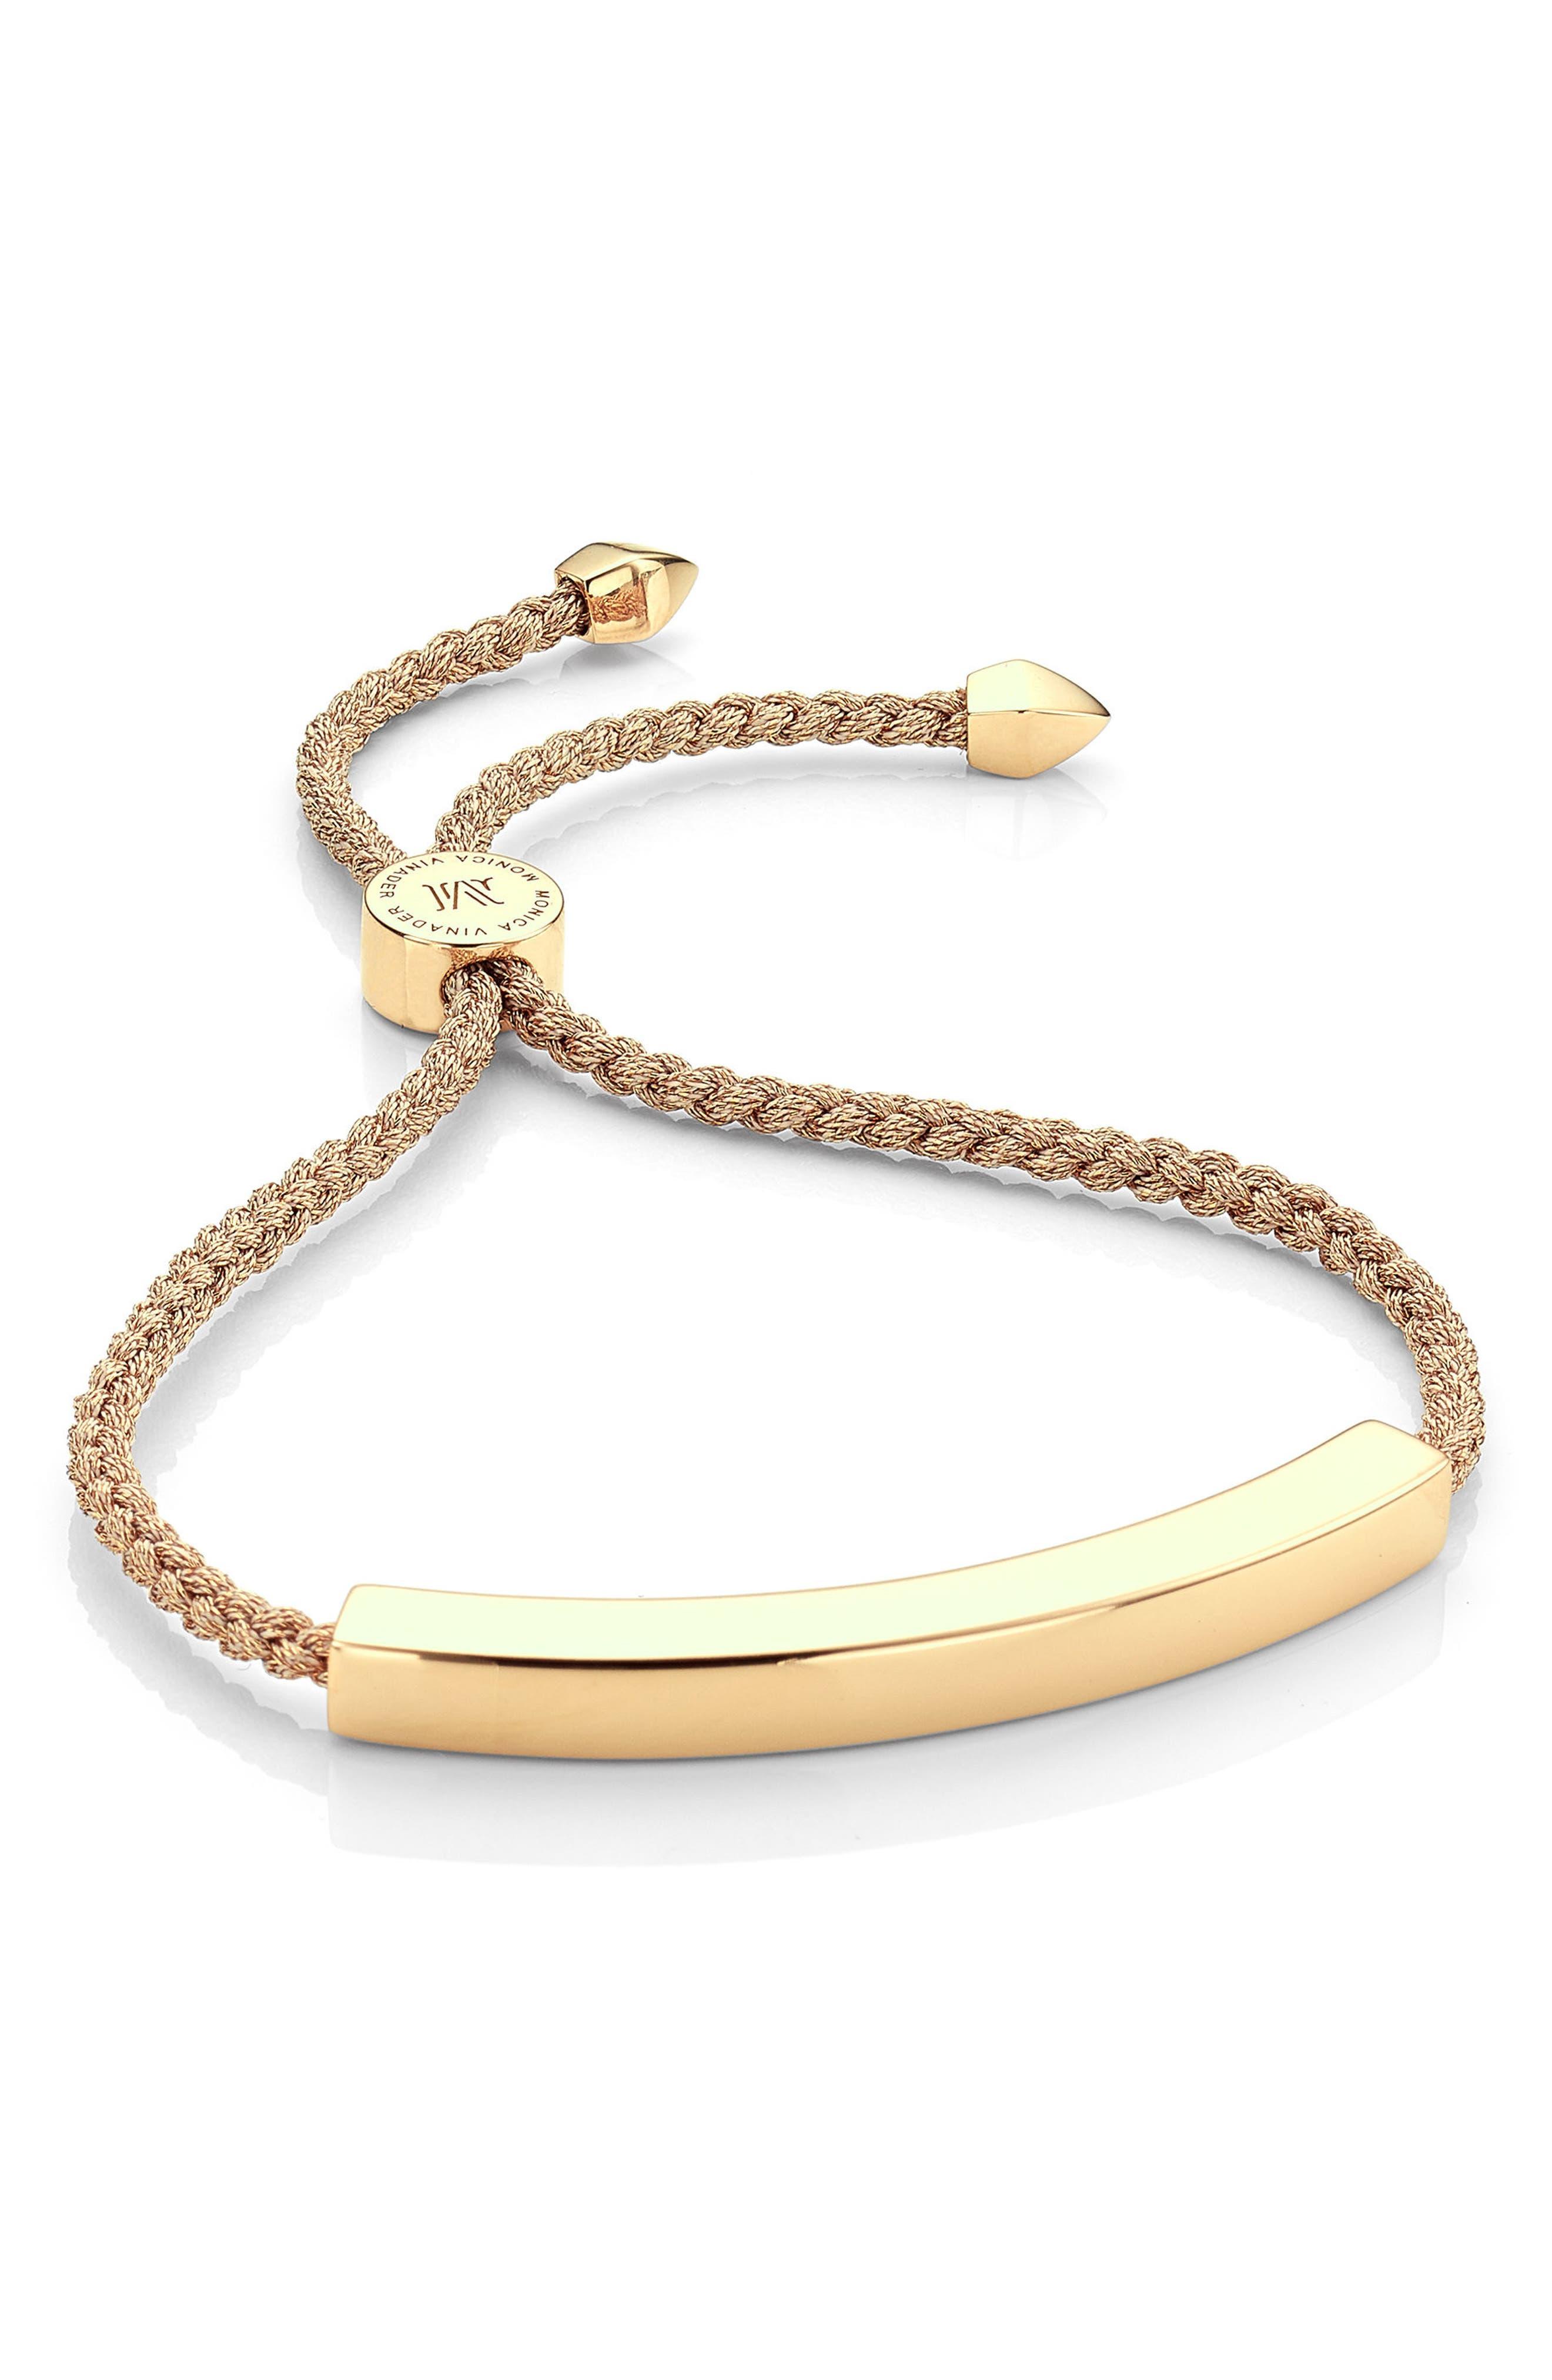 Engravable Linear Friendship Bracelet,                             Main thumbnail 1, color,                             METALLIC/ YELLOW GOLD